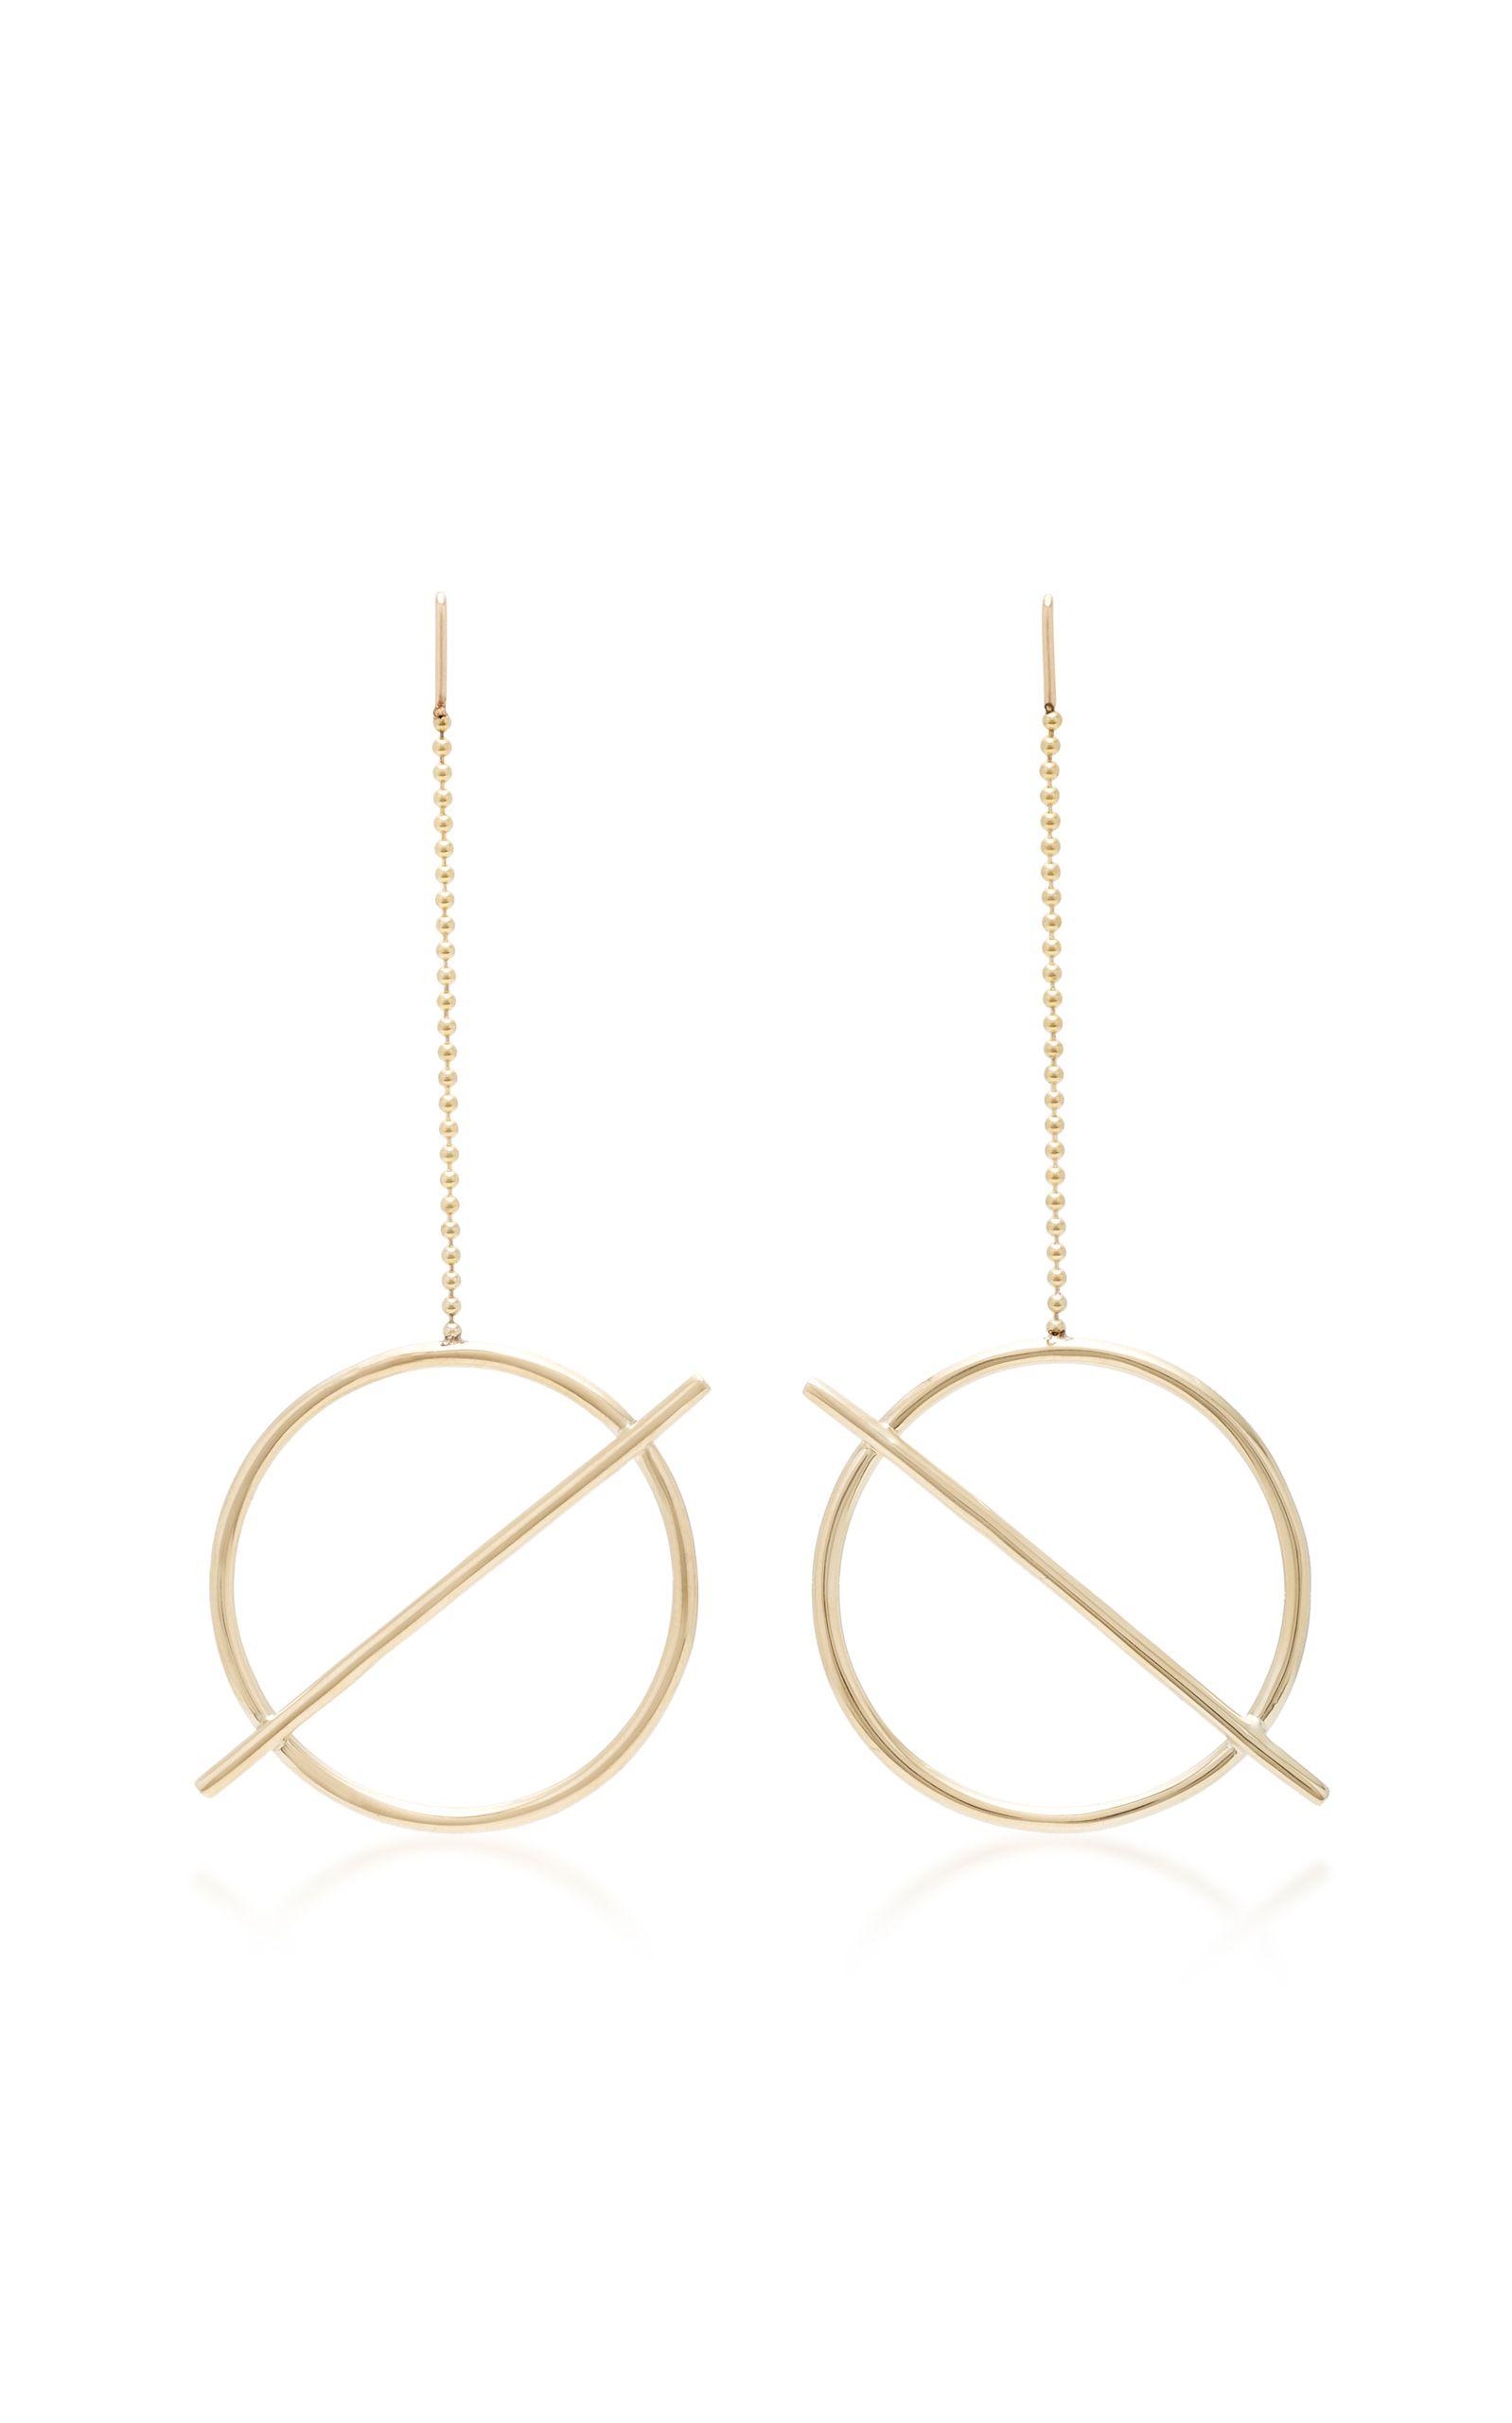 Aquilo 14K Gold Earrings Pili Restrepo K3cpsm